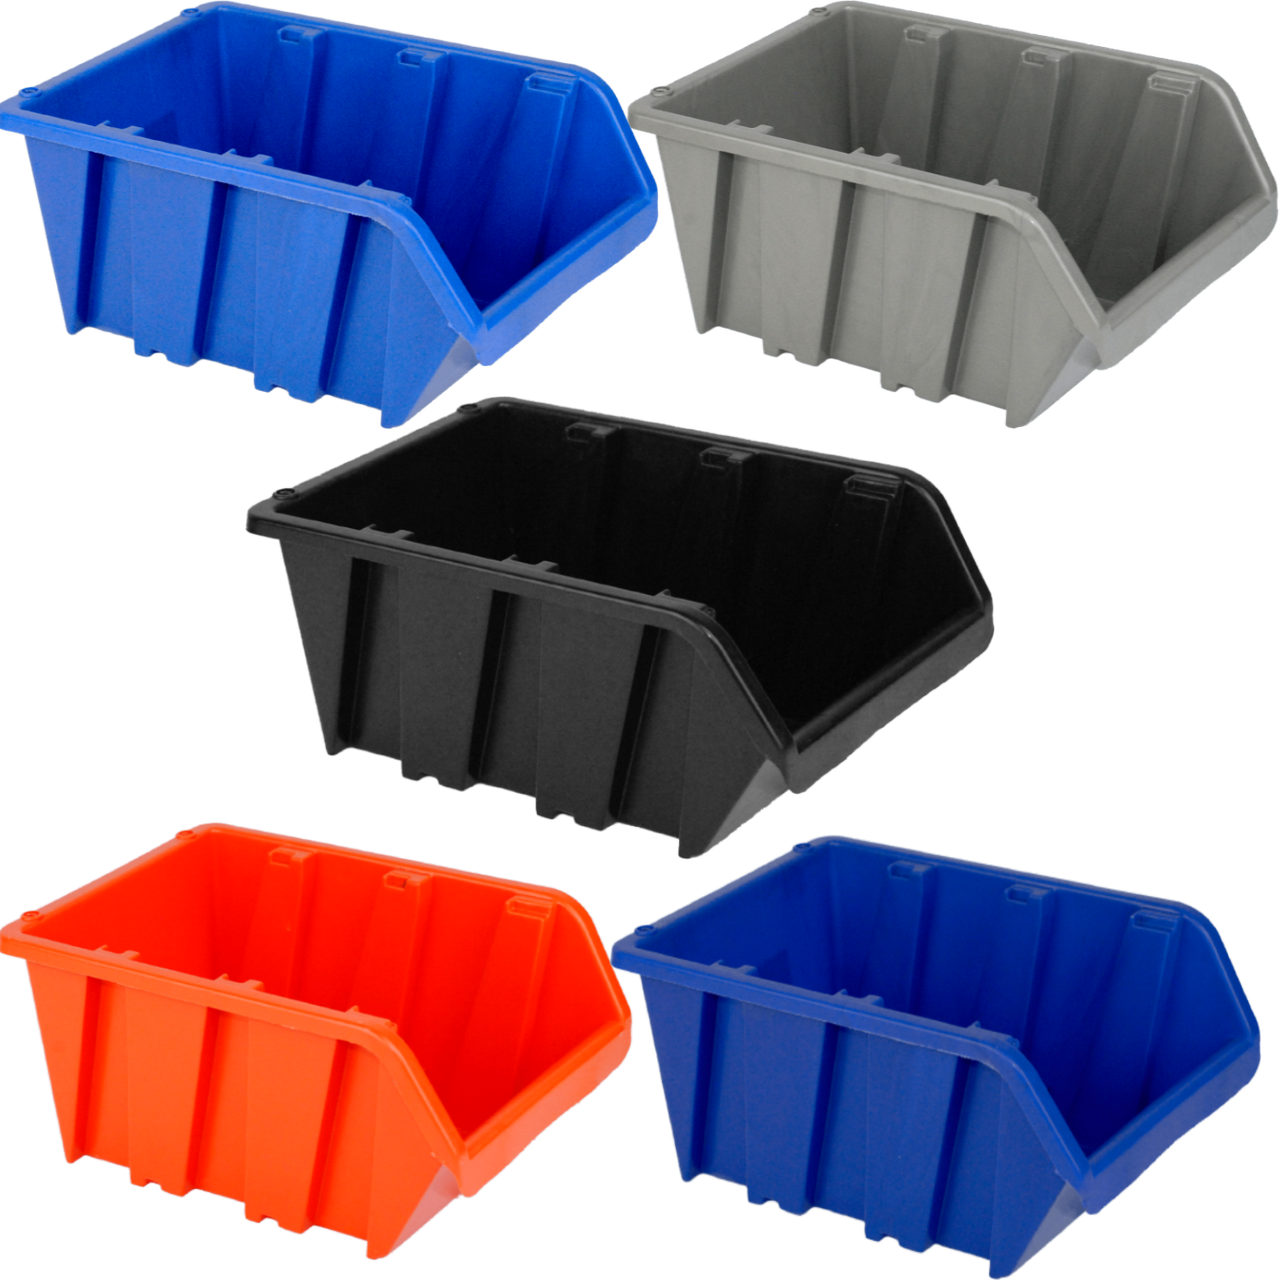 Ящик для метизов вставной средний  230х160х120 мм Синий